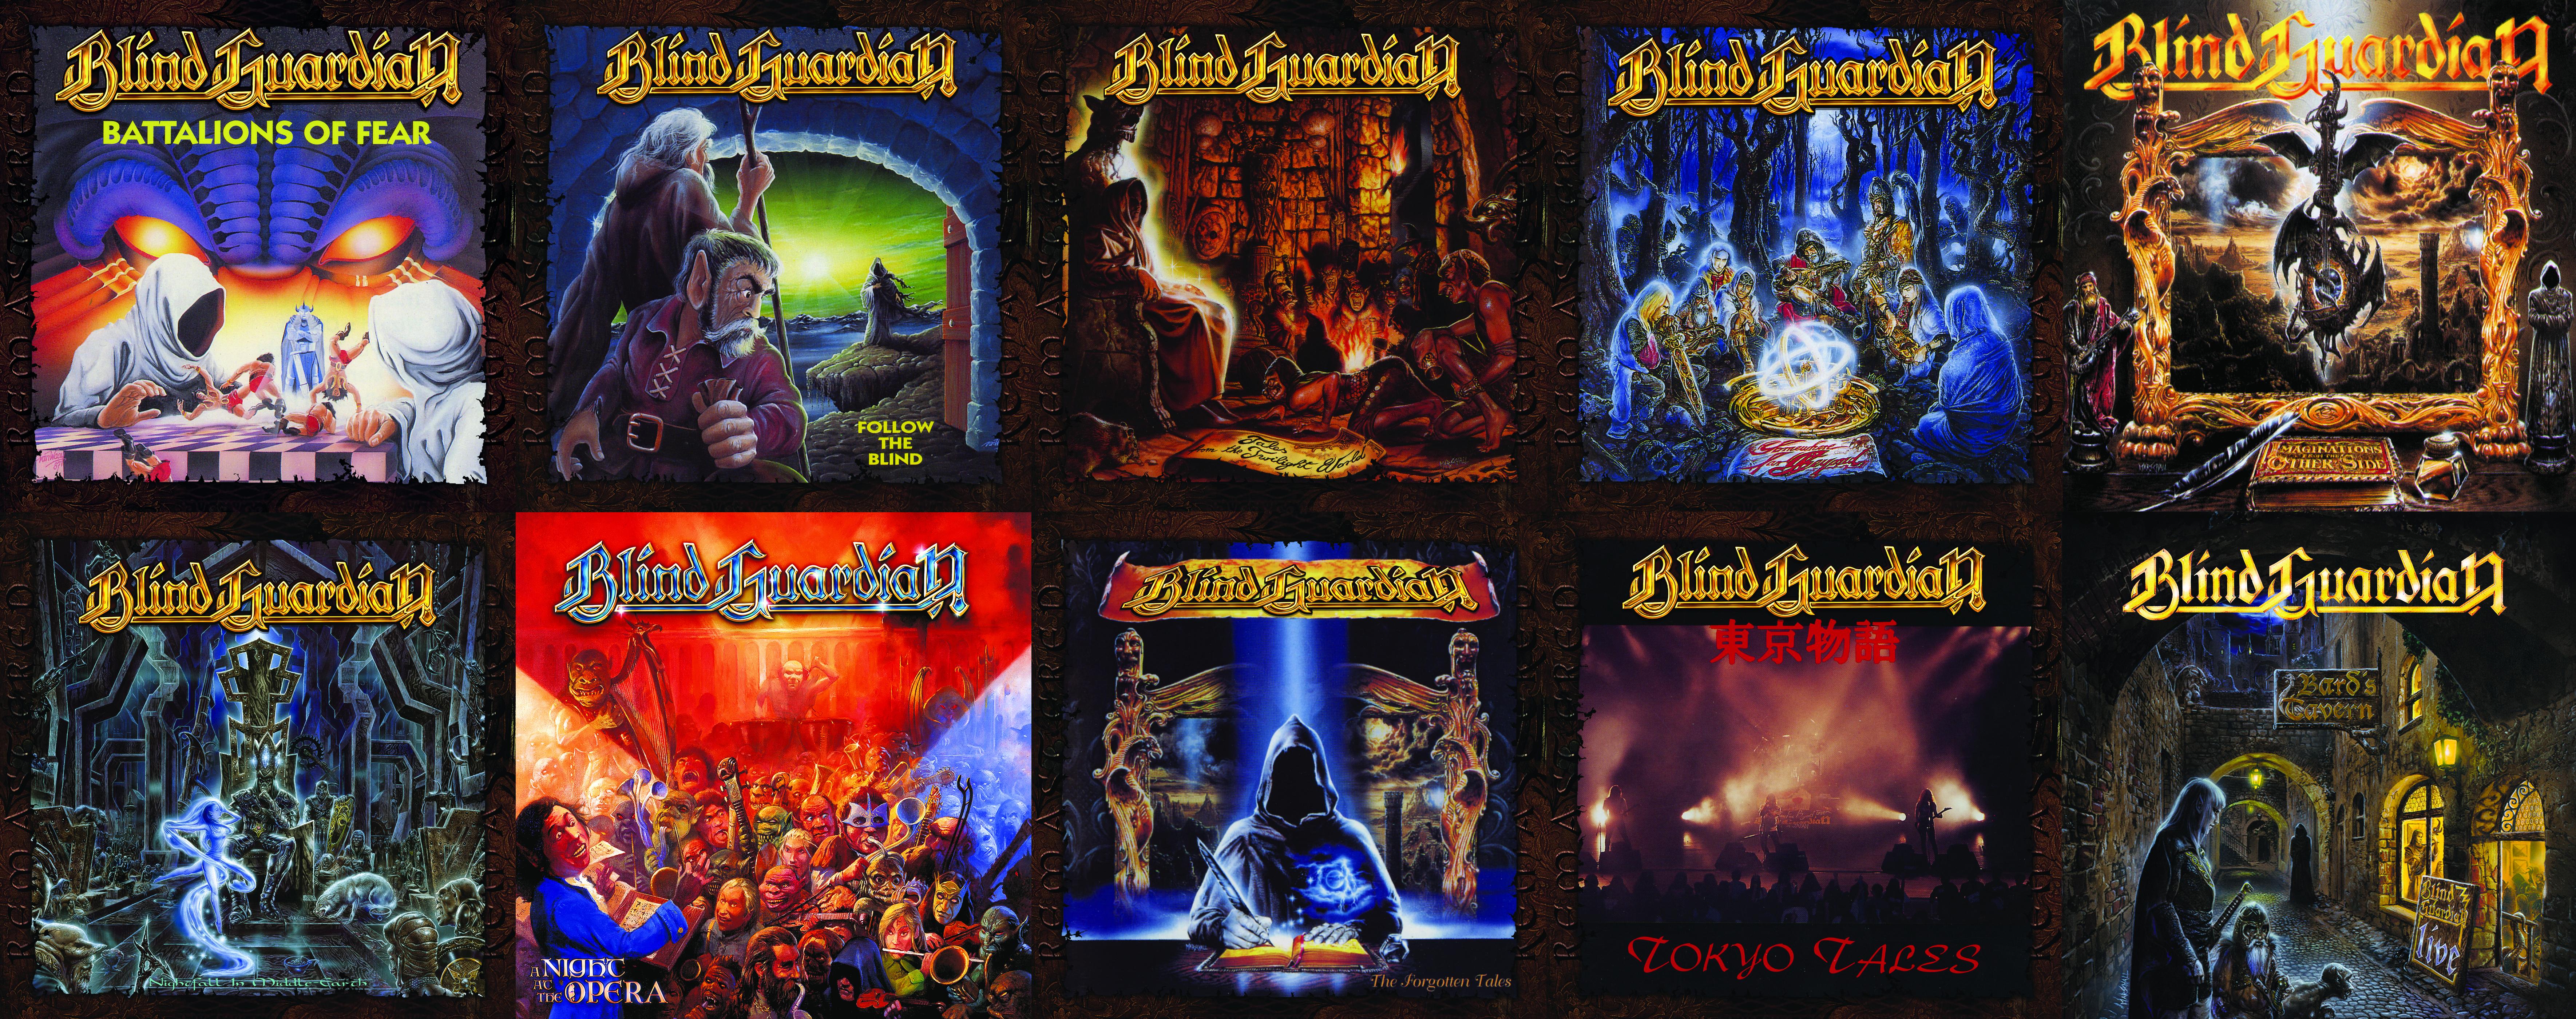 Blind Guardian – Reissues